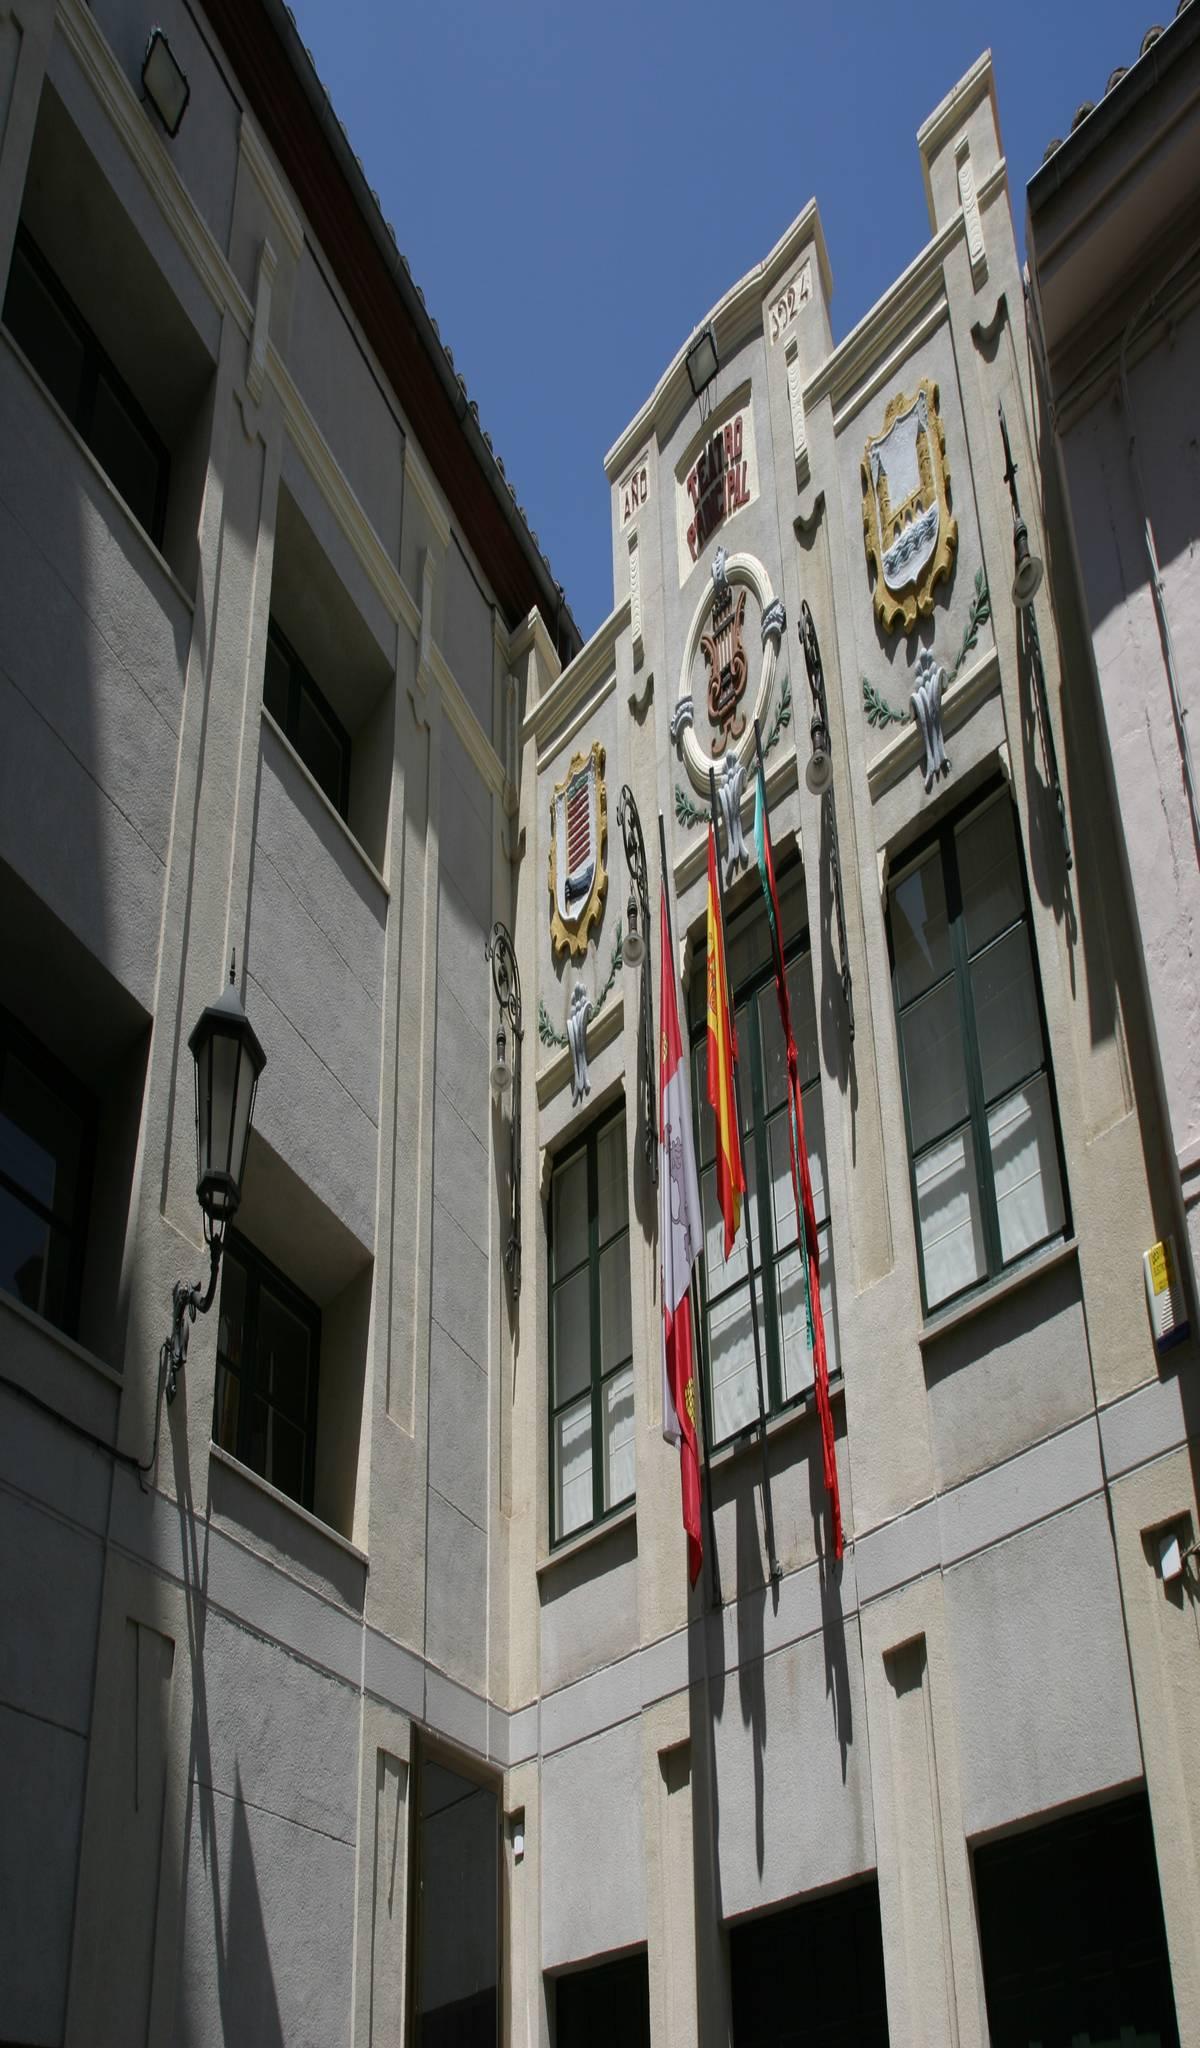 Teatro Principal de Zamora